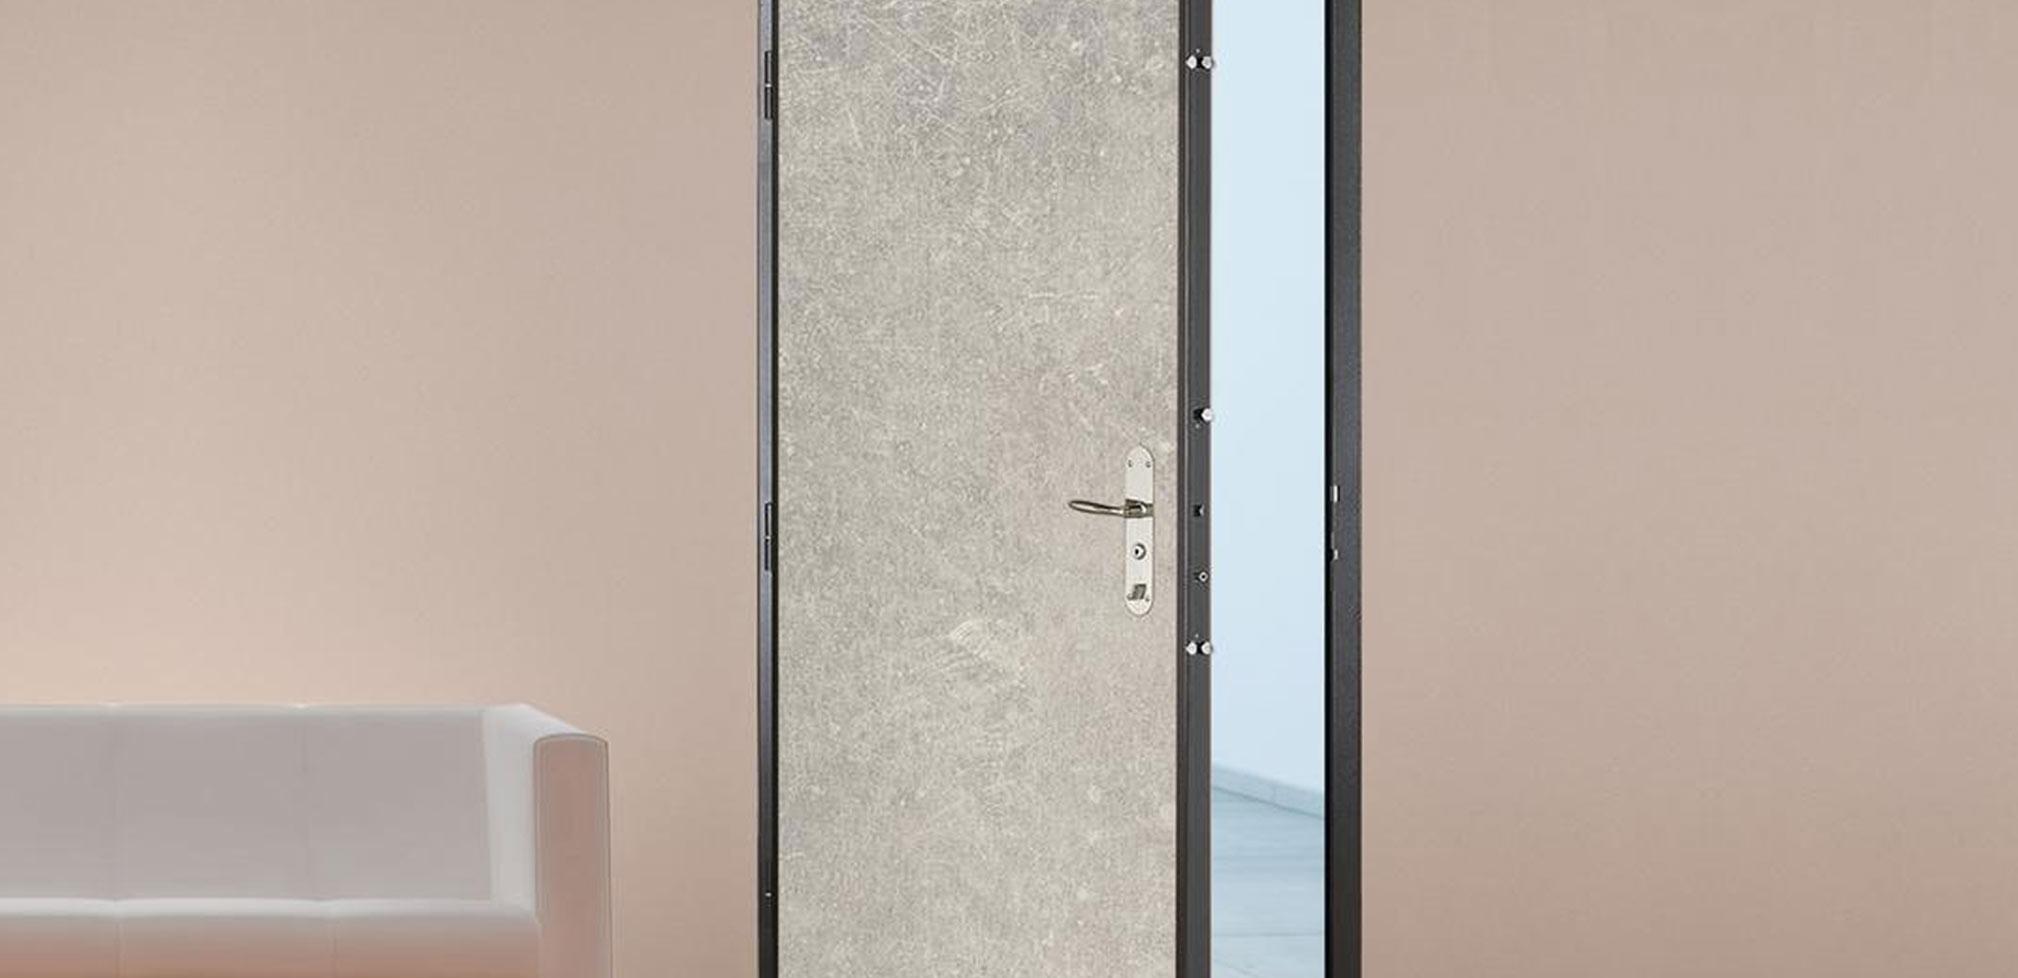 porte blind e picard maison paris home garde protection. Black Bedroom Furniture Sets. Home Design Ideas